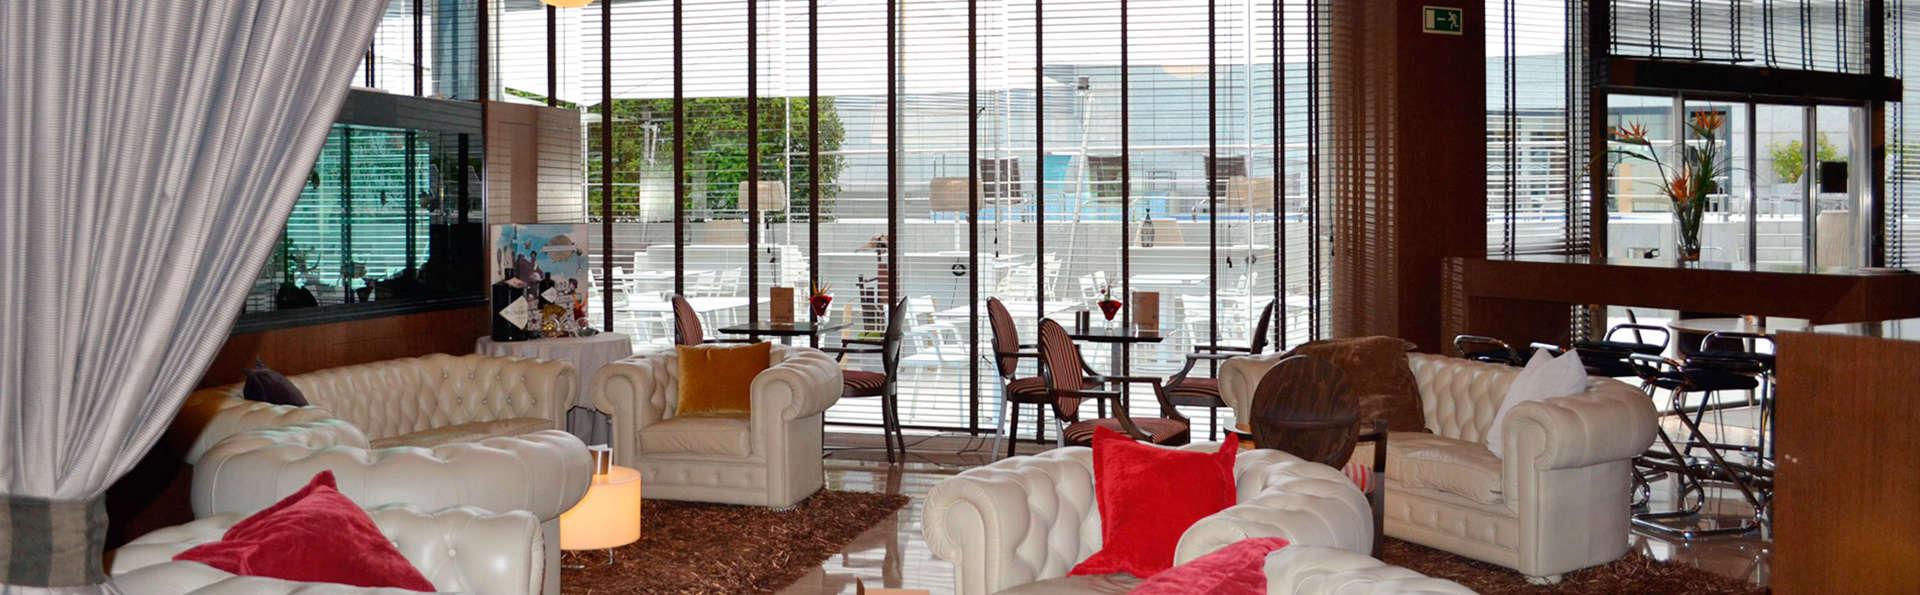 Hotel SB Icaria Barcelona - edit_lounge.jpg